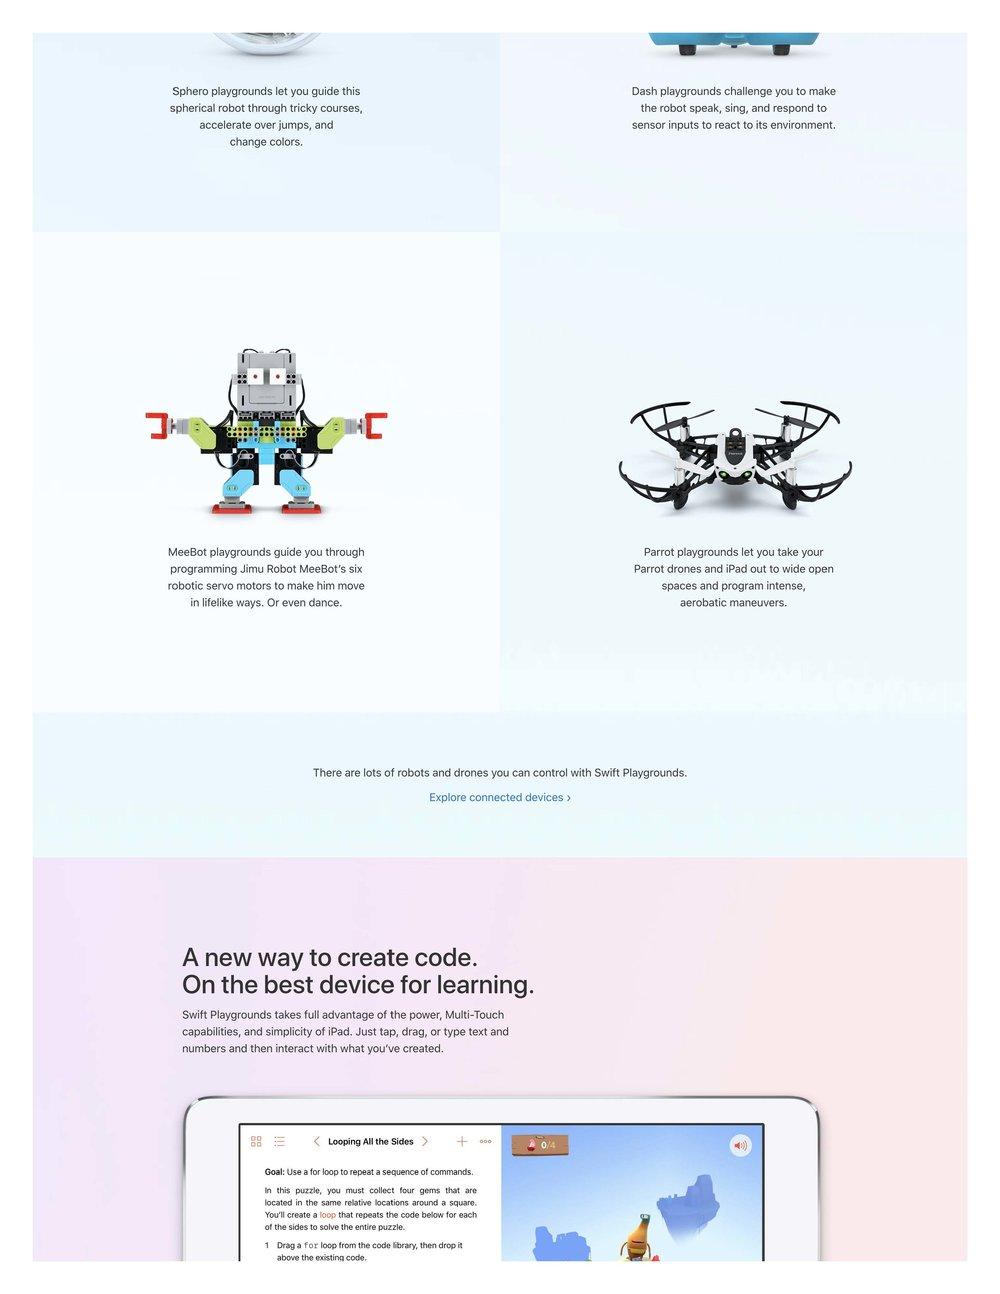 screencapture-apple-swift-playgrounds-2019-03-10-12_50_37_Page_5.jpg